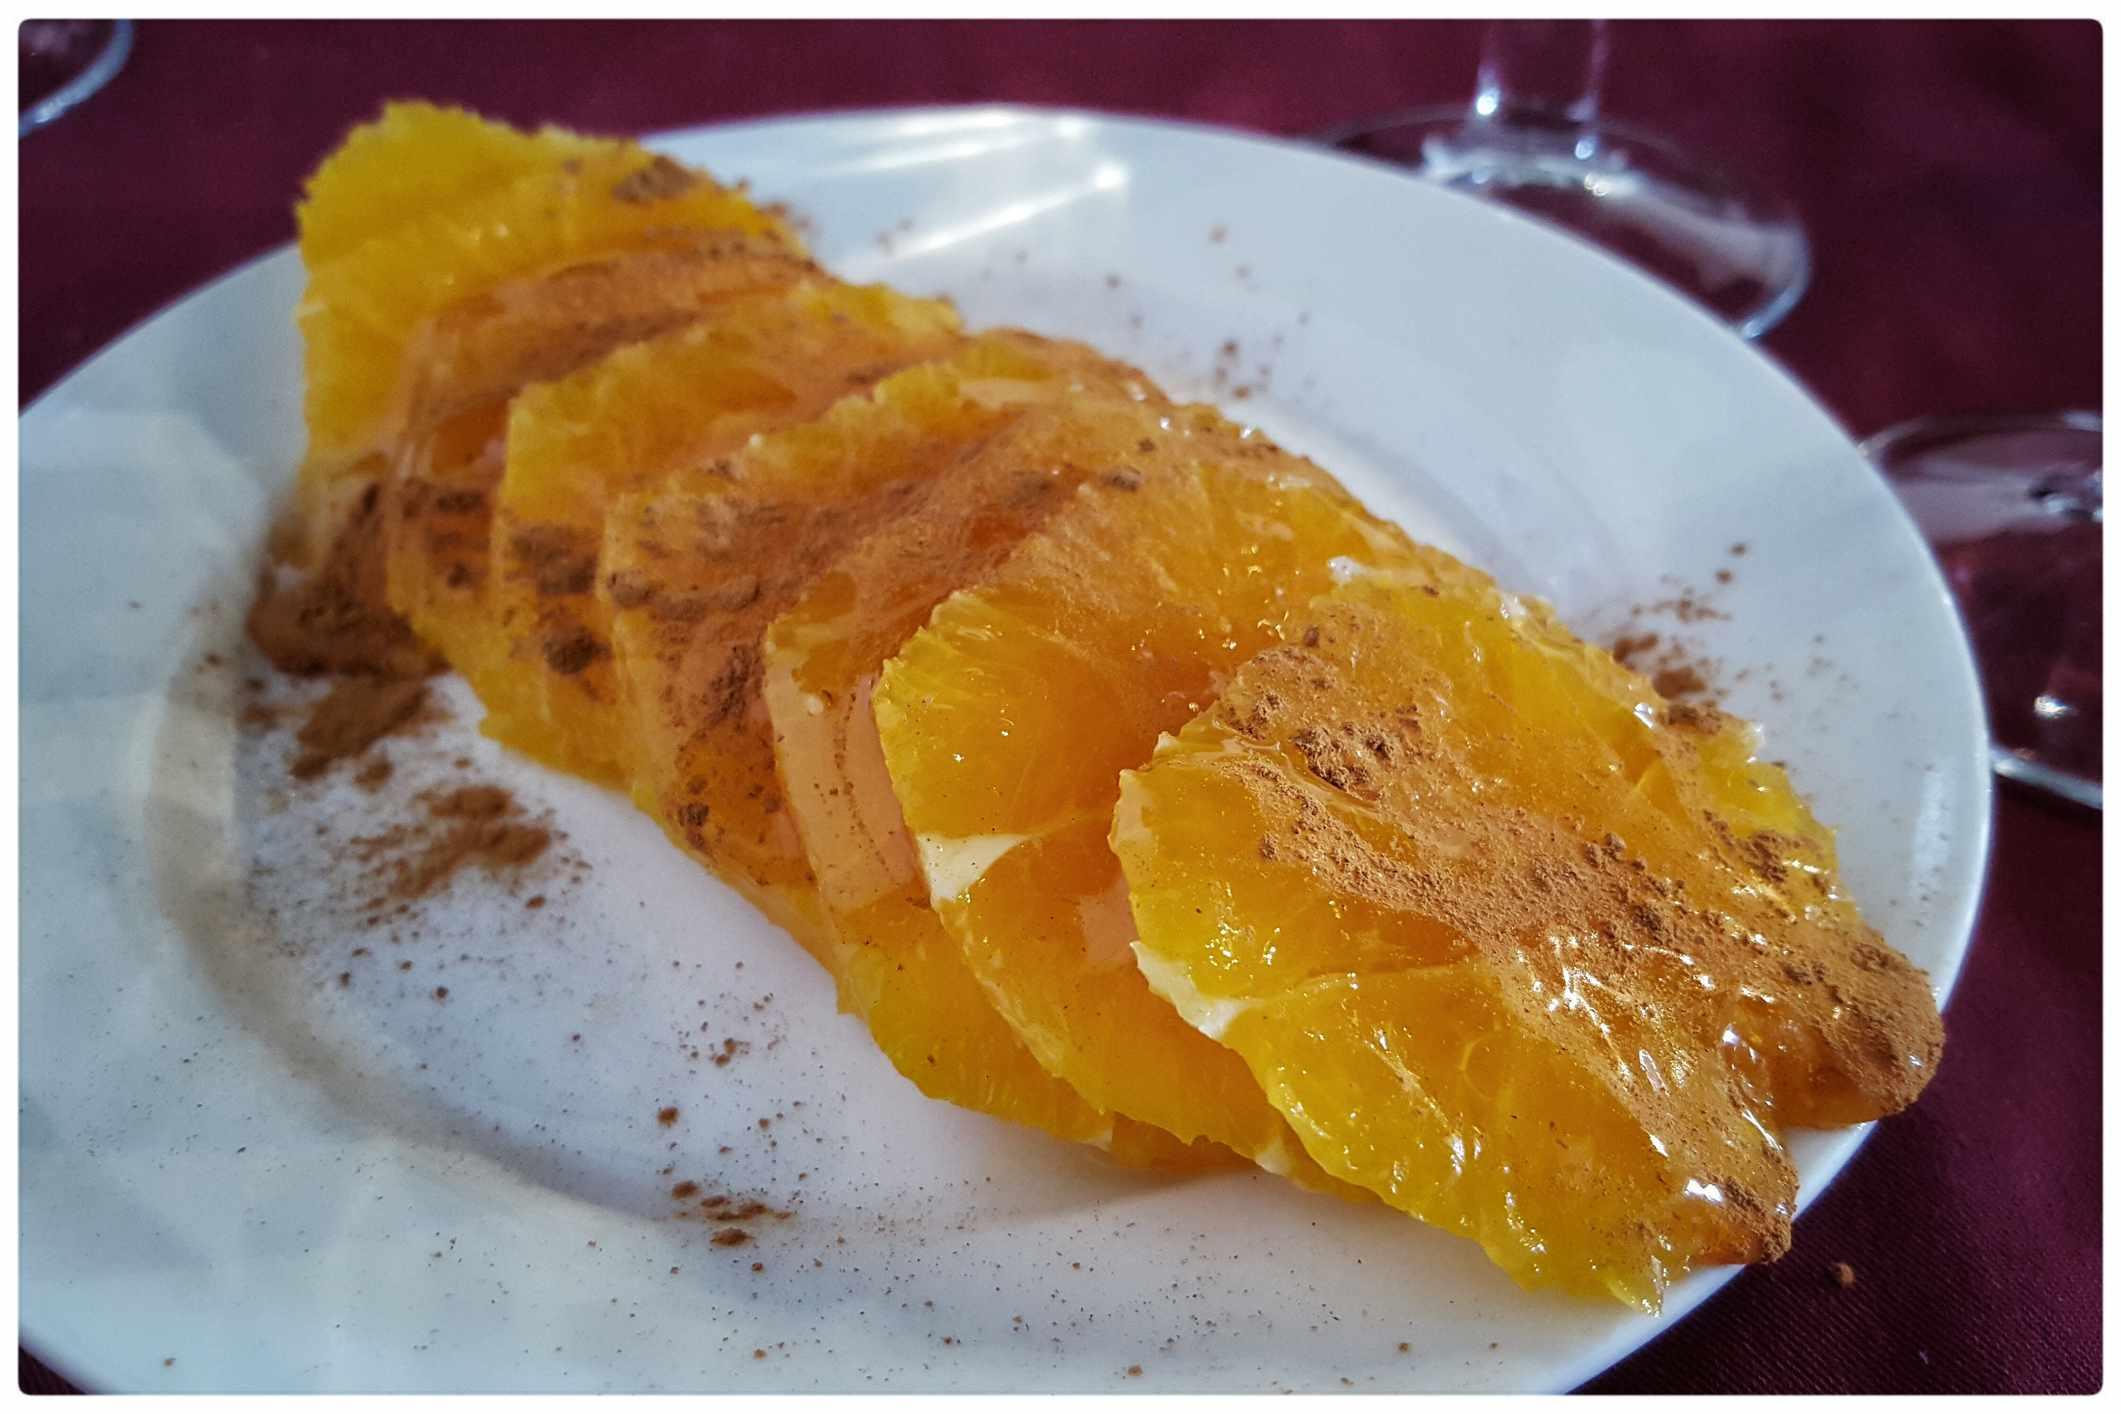 Greek oranges with honey and cinnamon